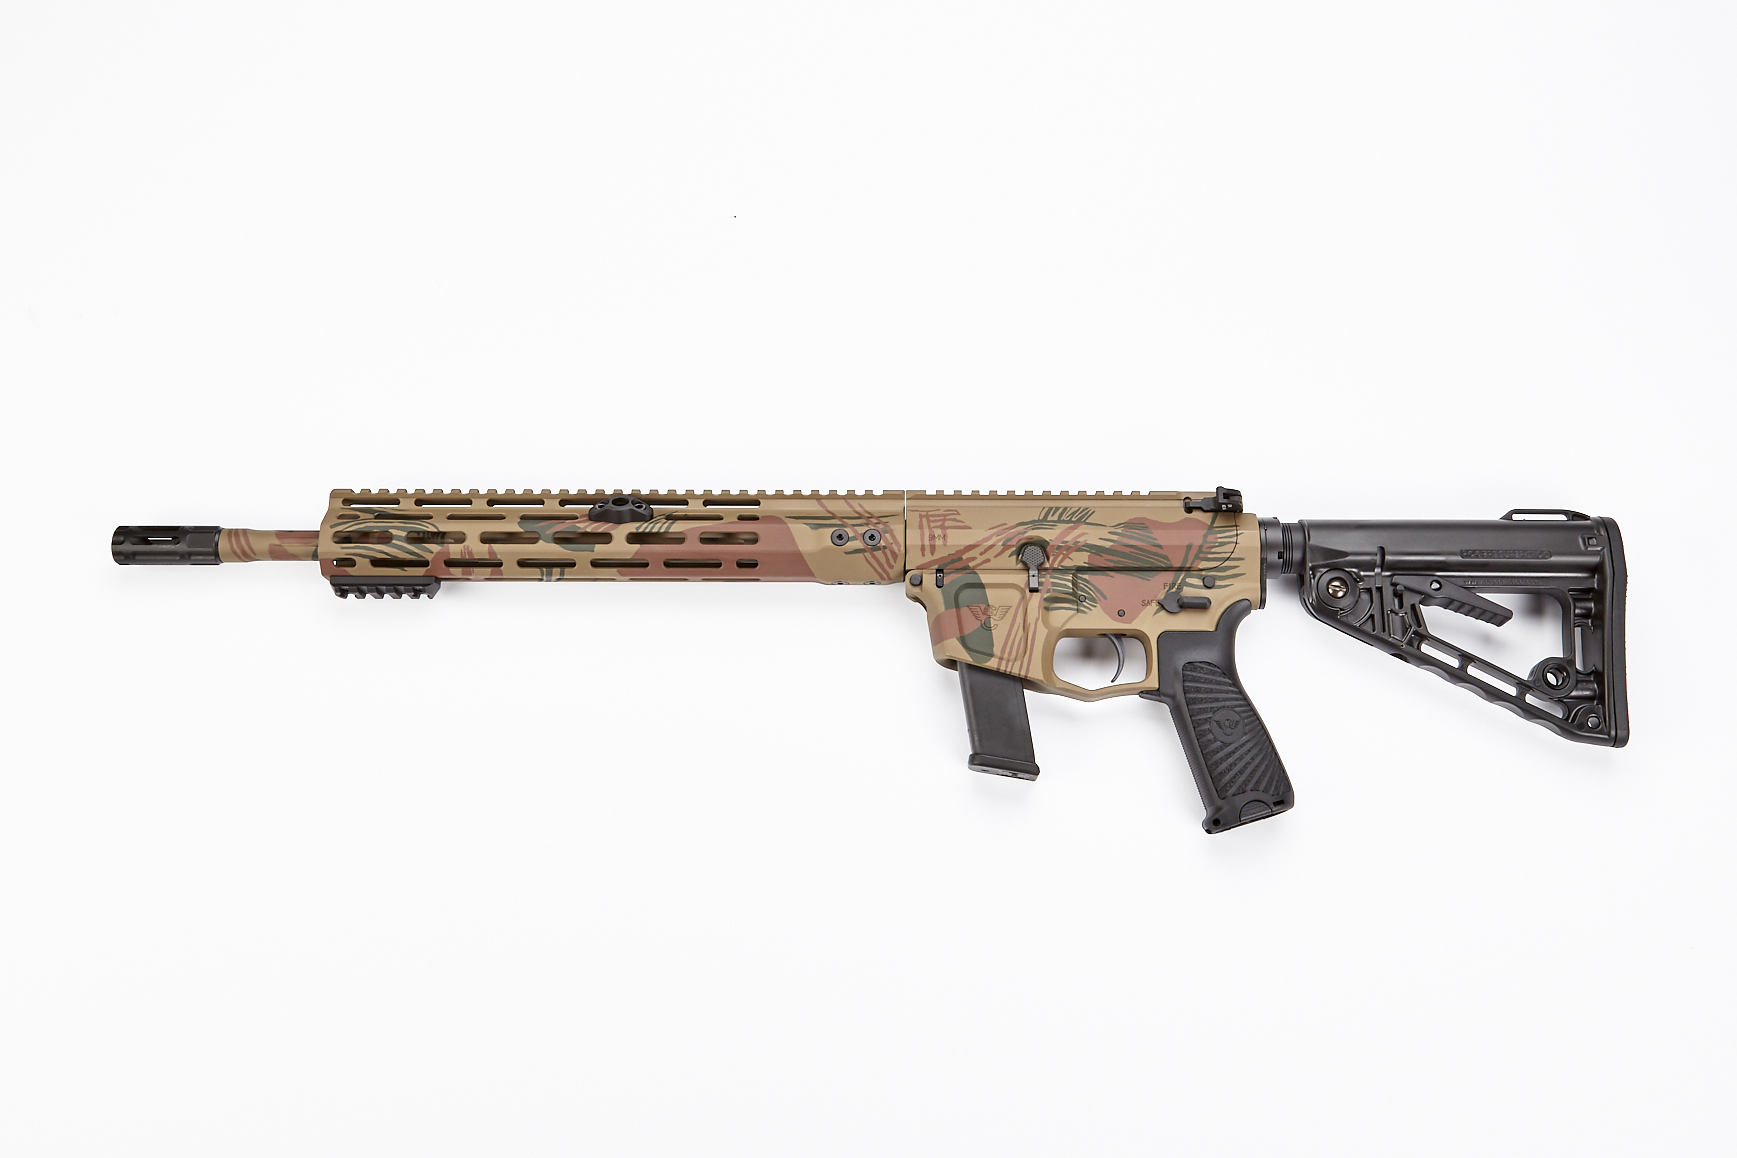 AR9 Carbine, Glock Receiver, 9mm, 14 7